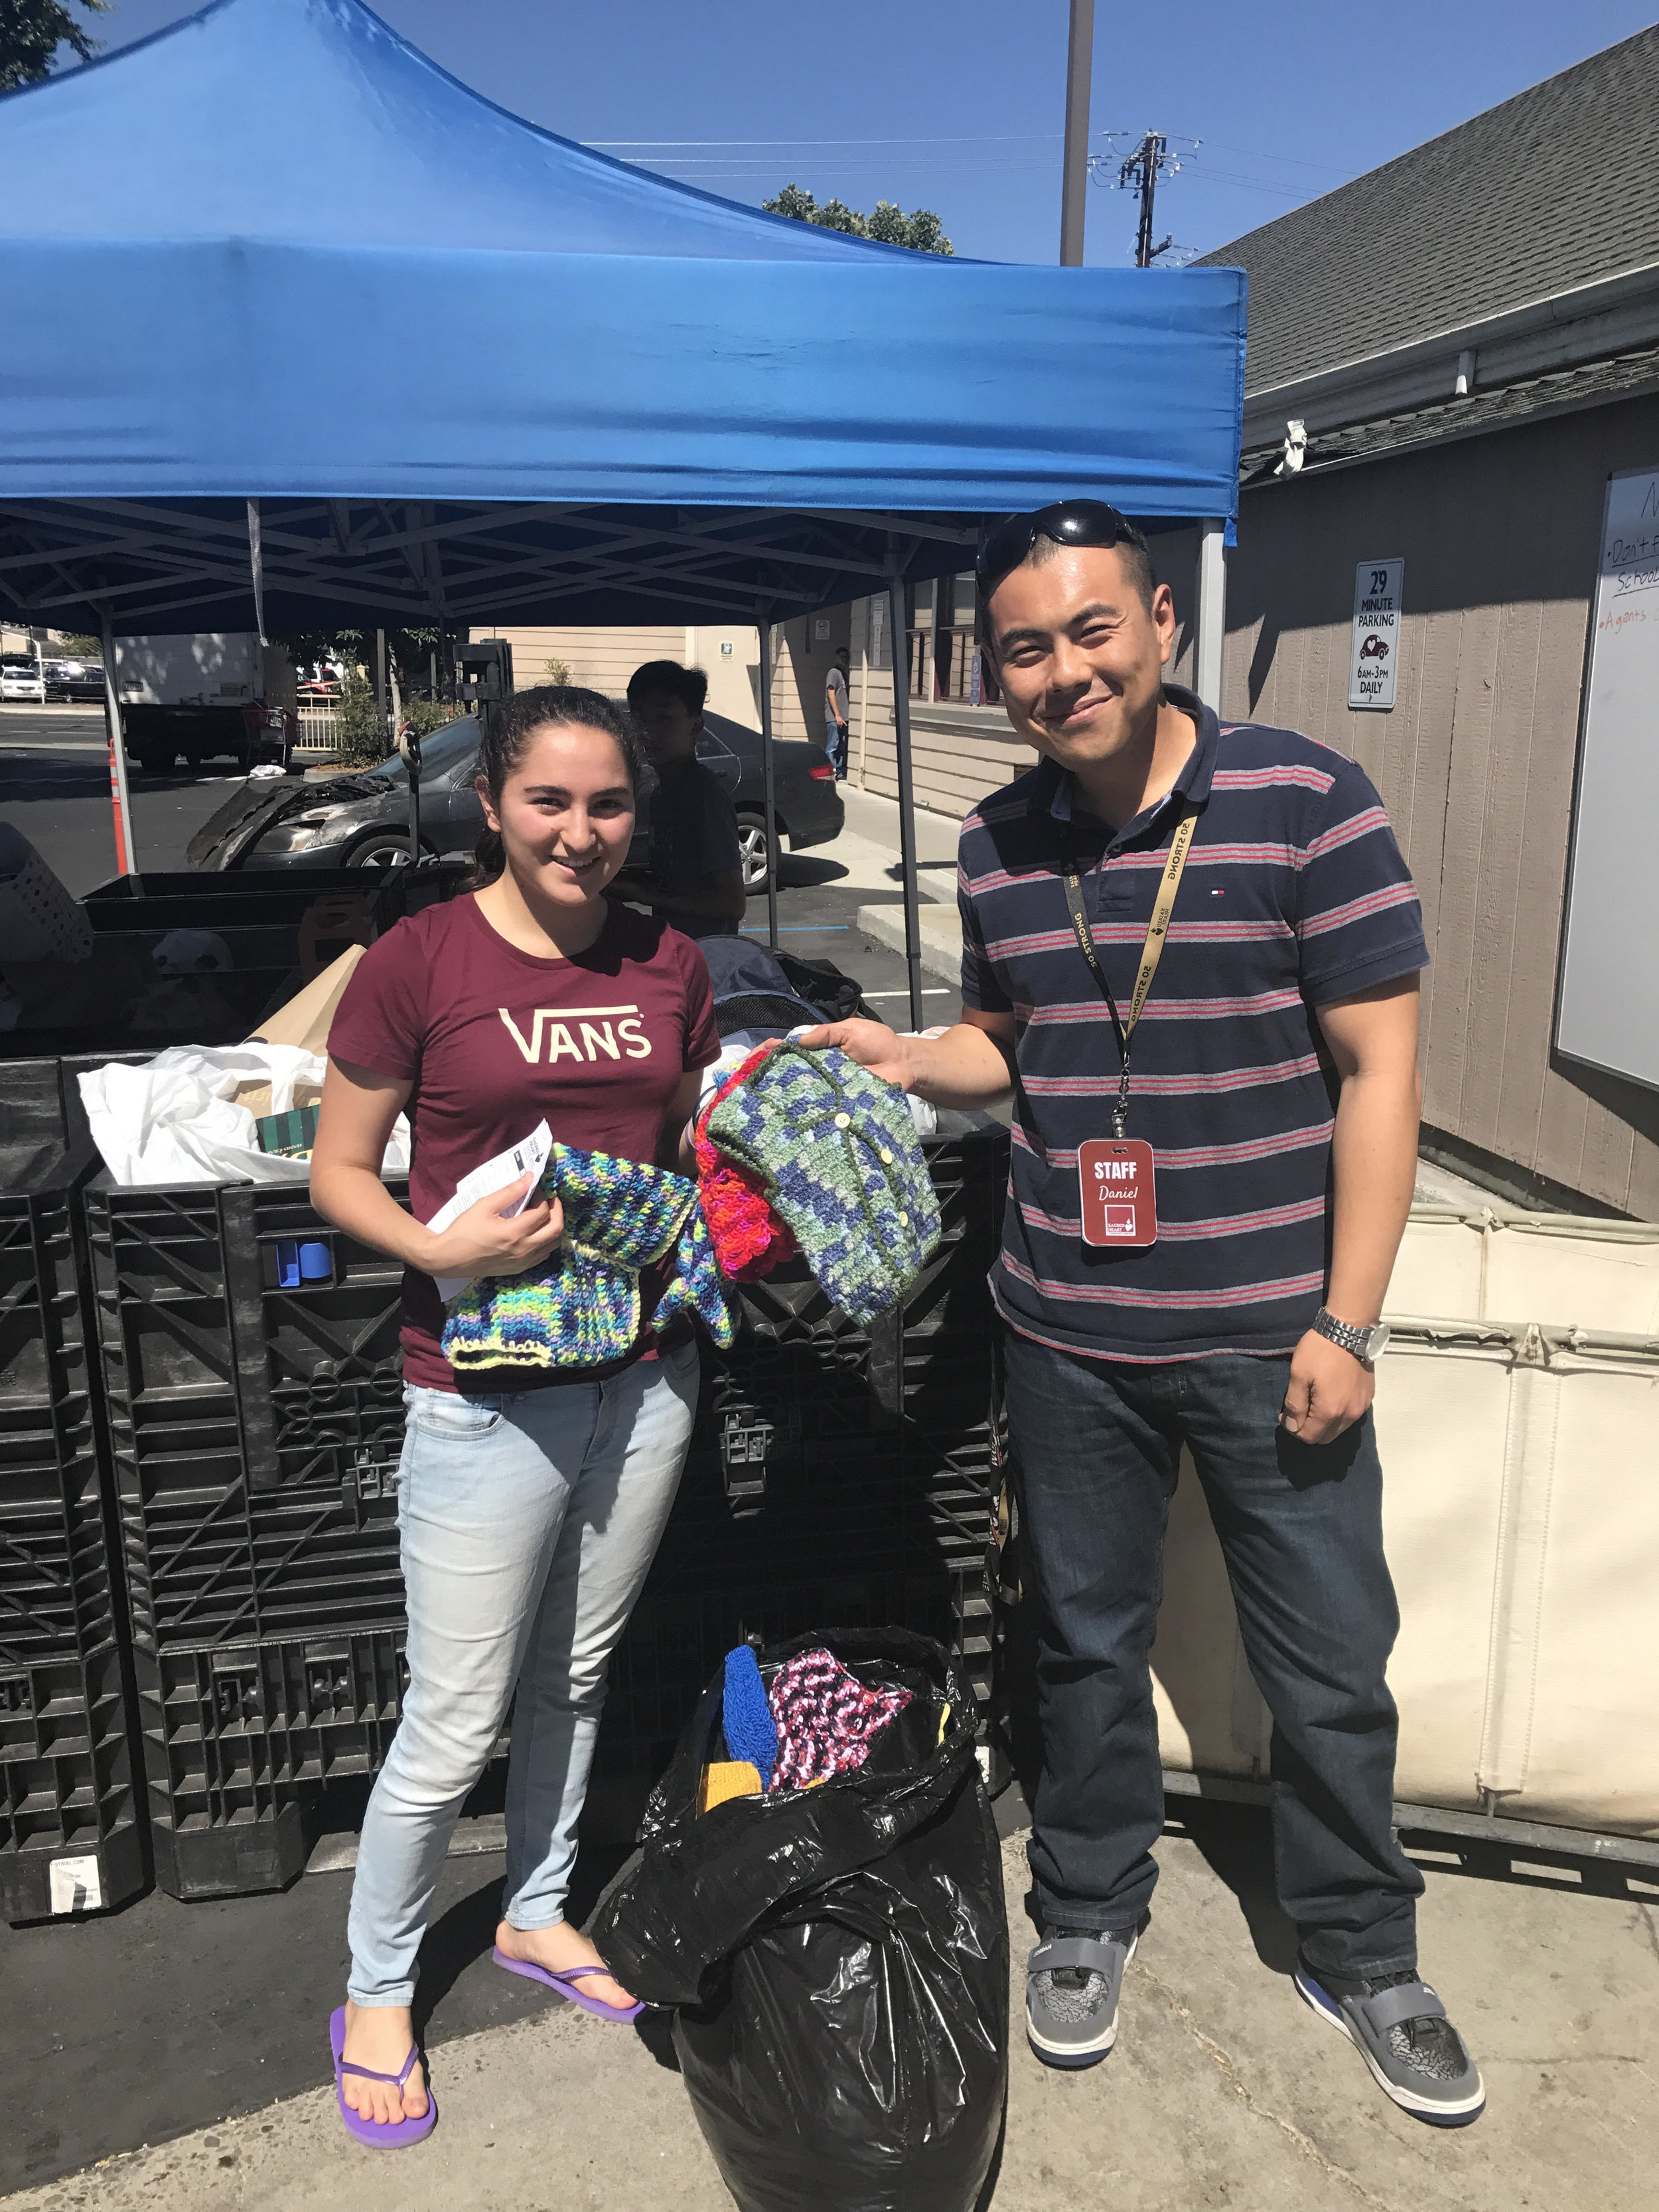 Dania making a donation at Sacred Heart Community Service